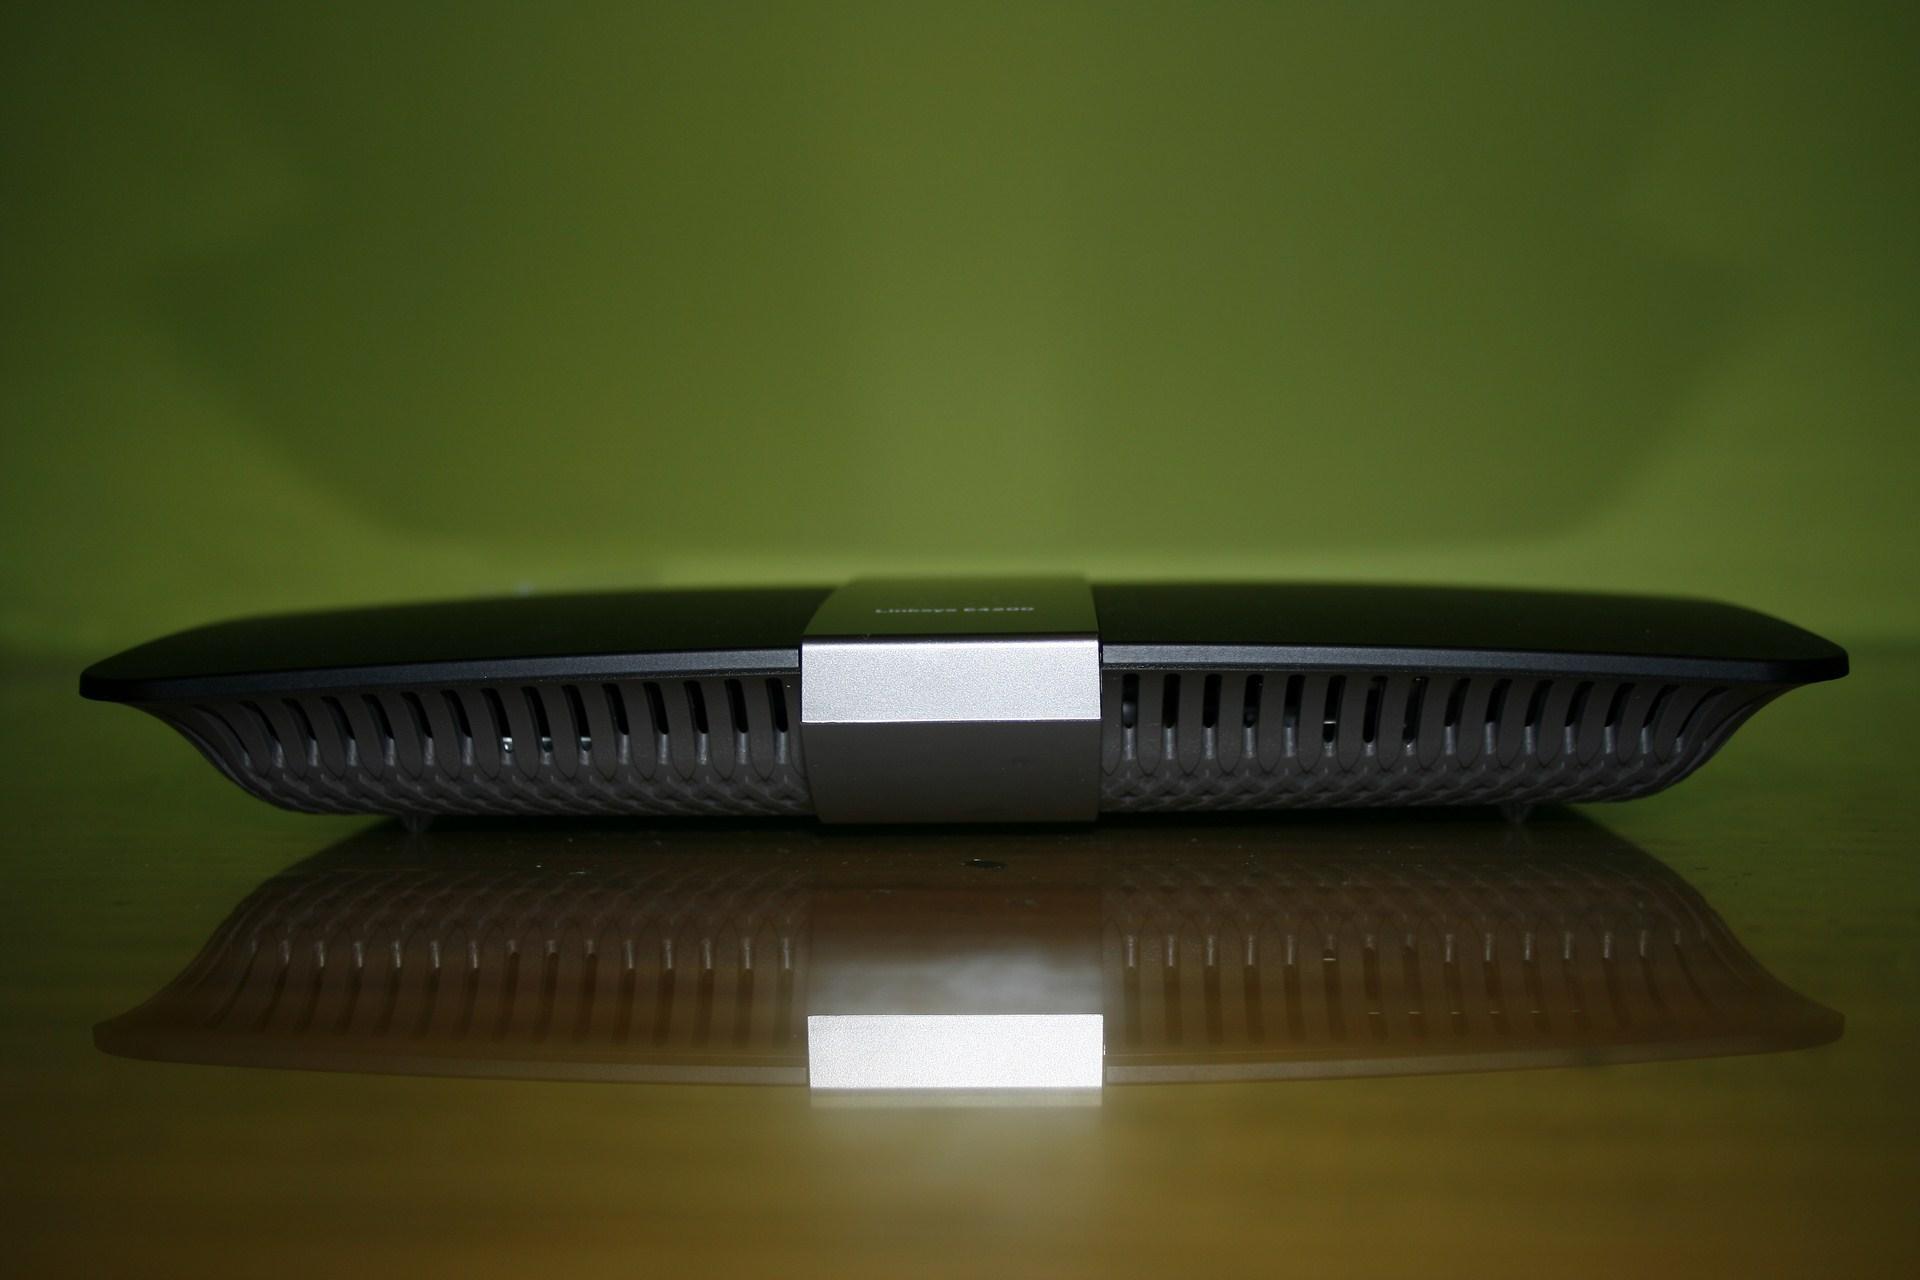 Cisco Linksys E4200 : Análisis a fondo de este router neutro Gigabit